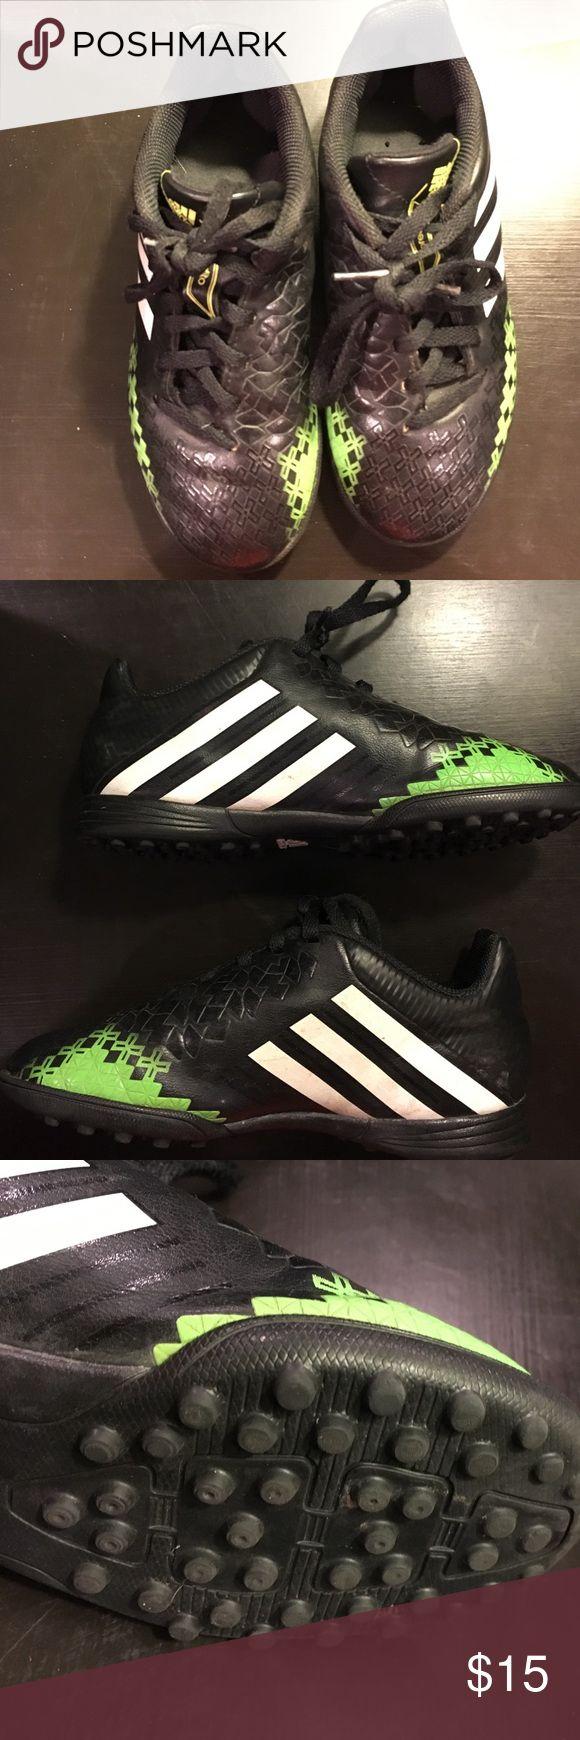 zapatillas adidas soccer predito lz trx tf j